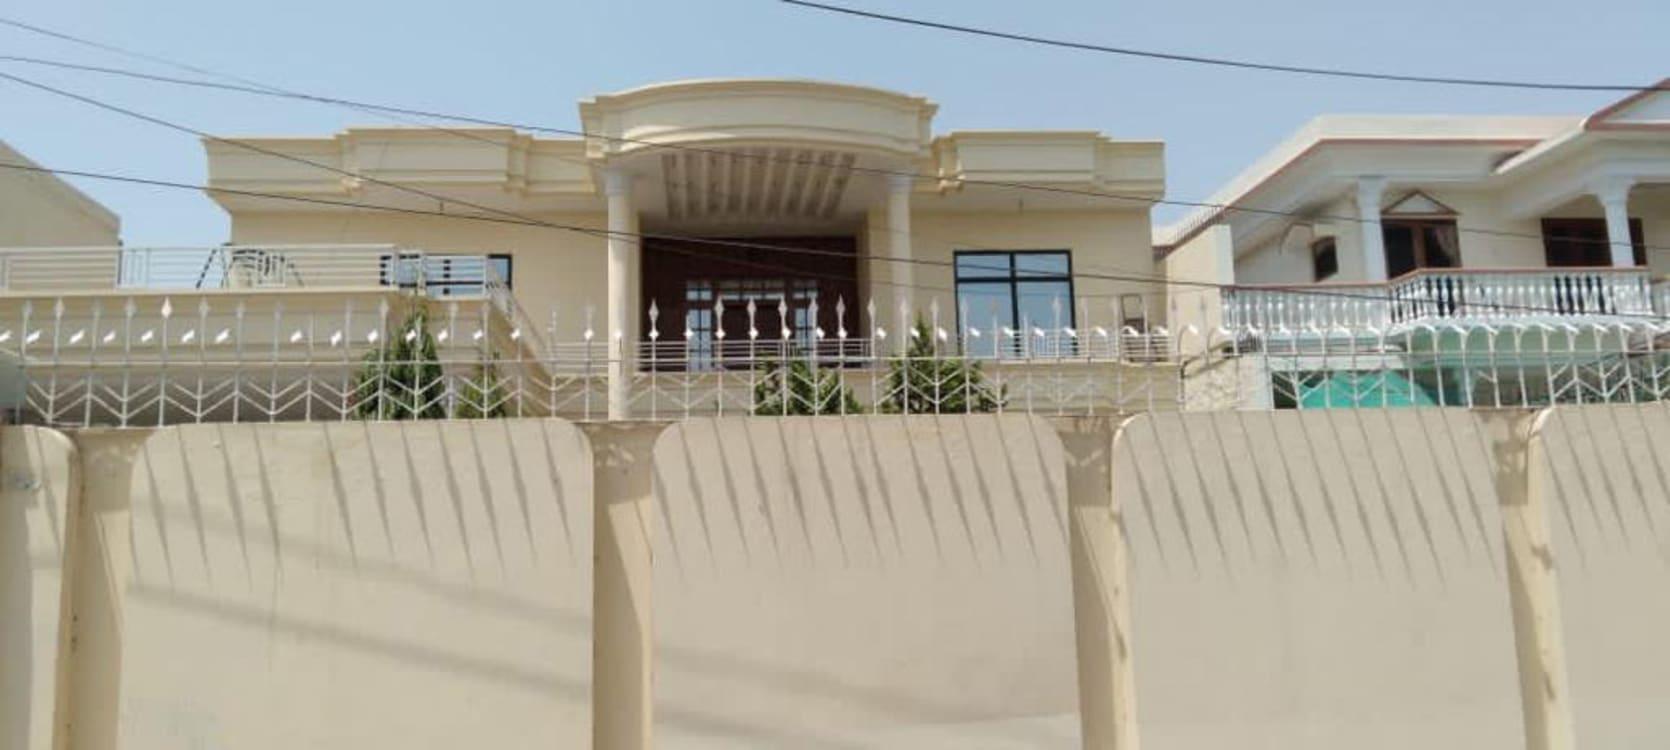 15 Marla House For Rent | Graana.com